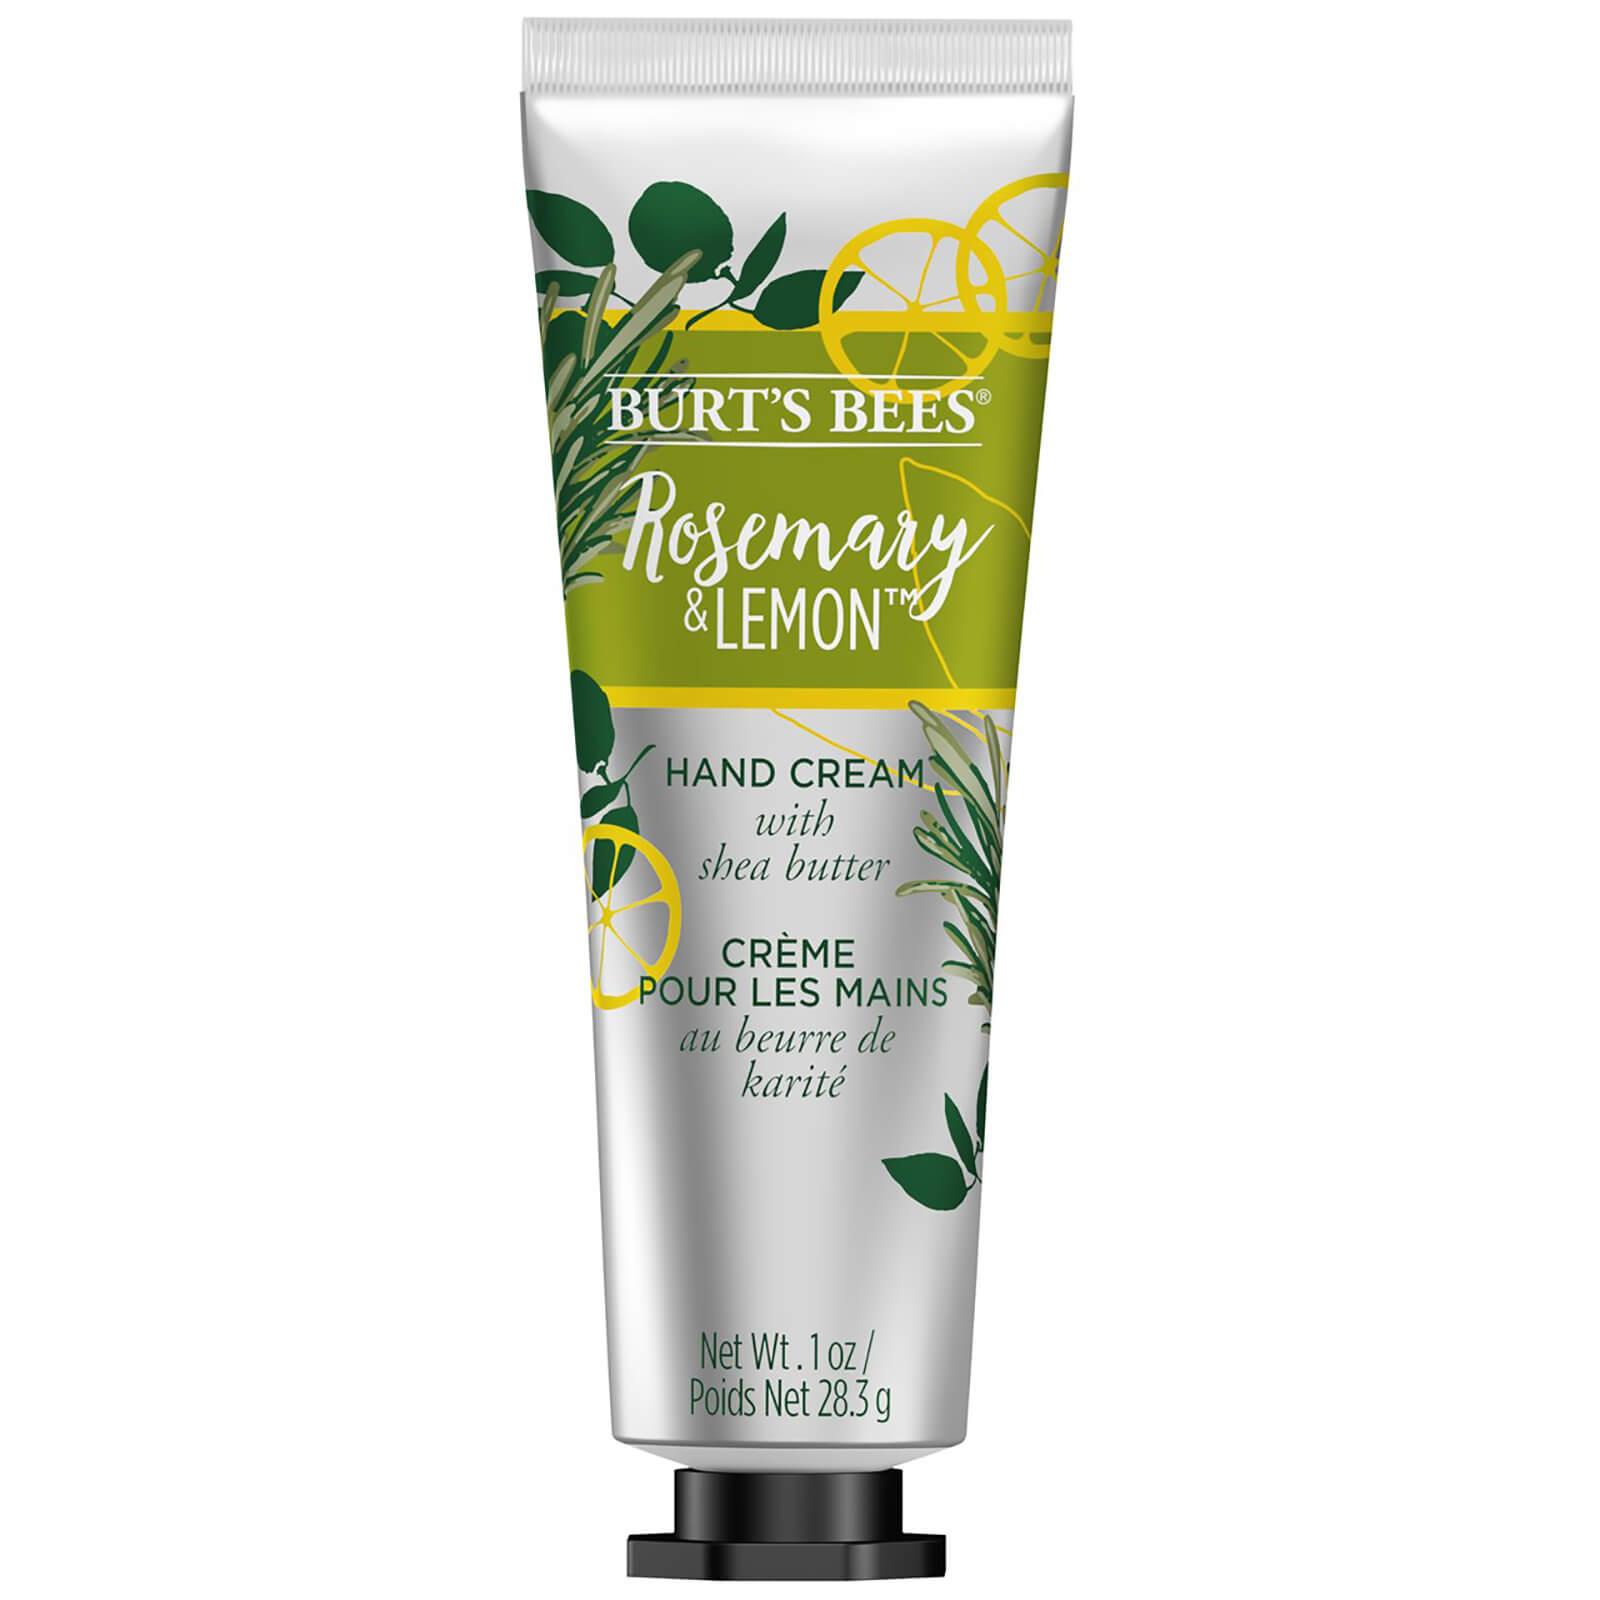 Купить Burt's Bees Hand Cream with Shea Butter, Rosemary and Lemon 28.3g